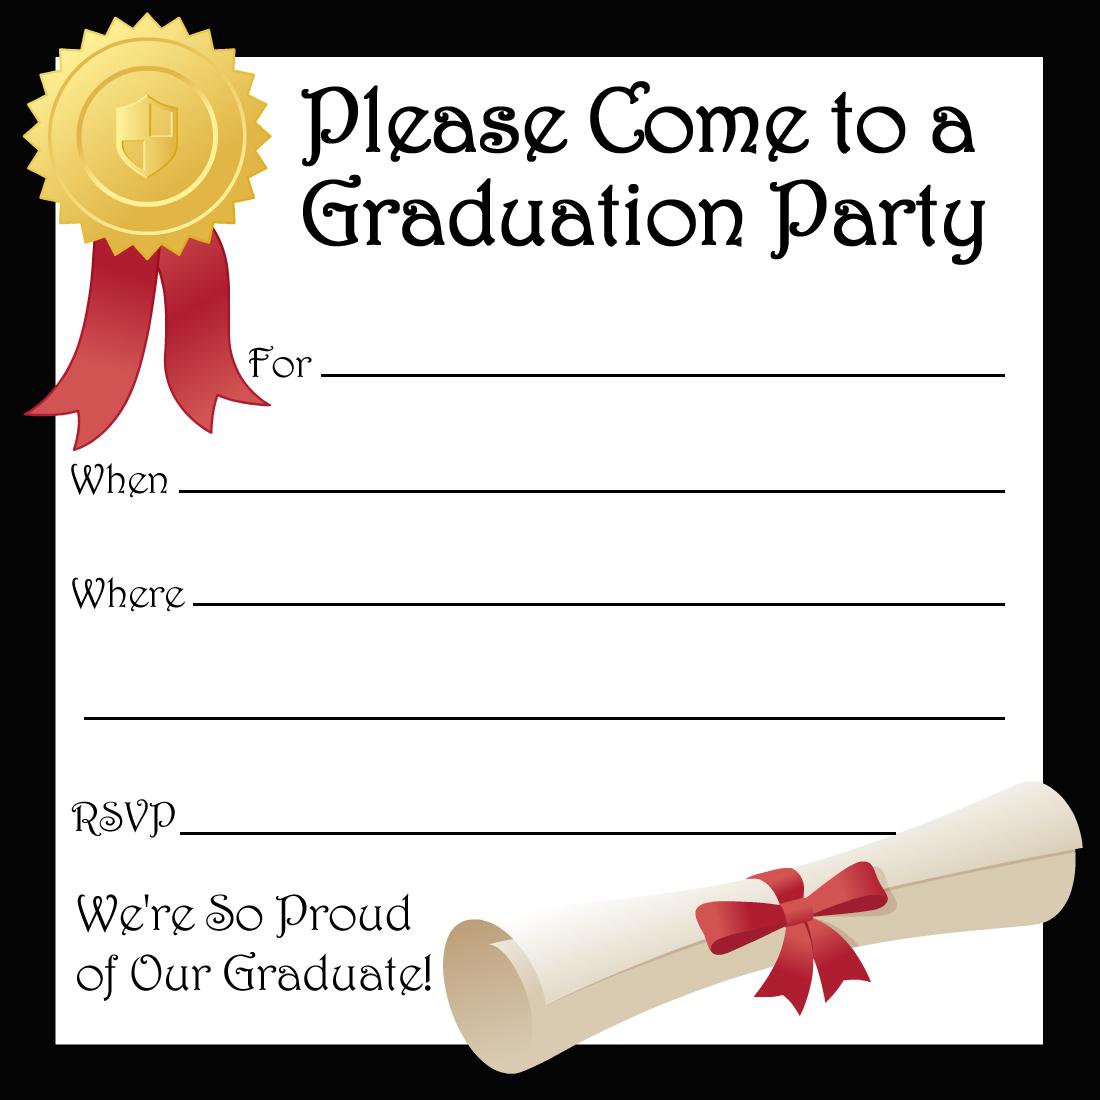 Free Printable Graduation Party Invitations | High School Graduation - Free Printable Graduation Party Invitations